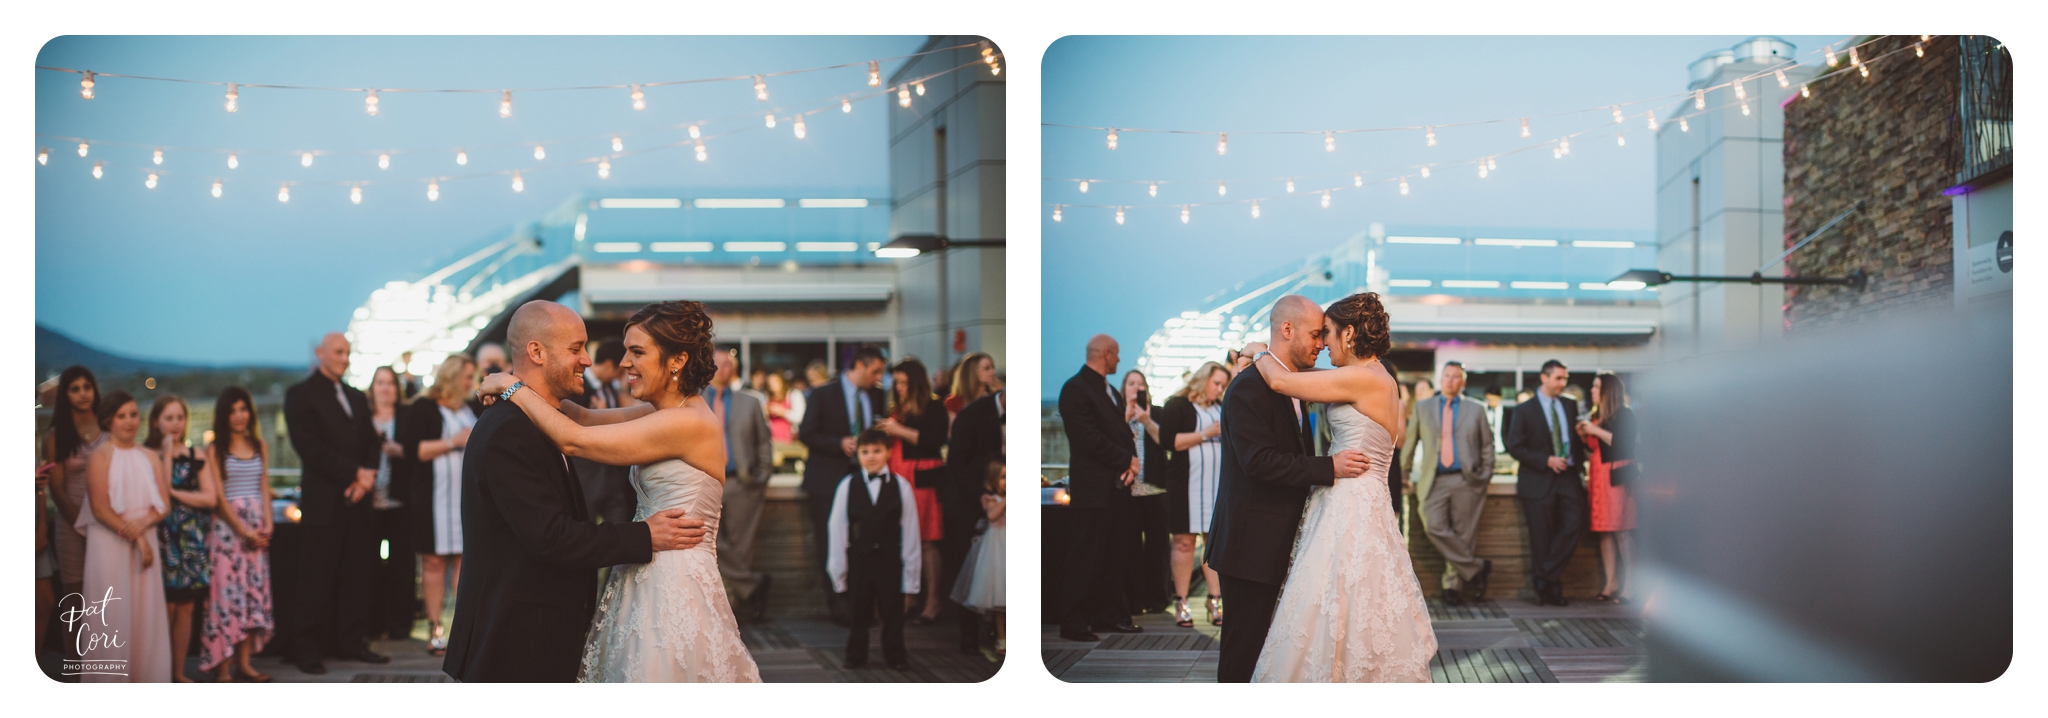 Center-in-the-Square-_-Weddings-Wedding-Photographer-Virginia-038.jpg